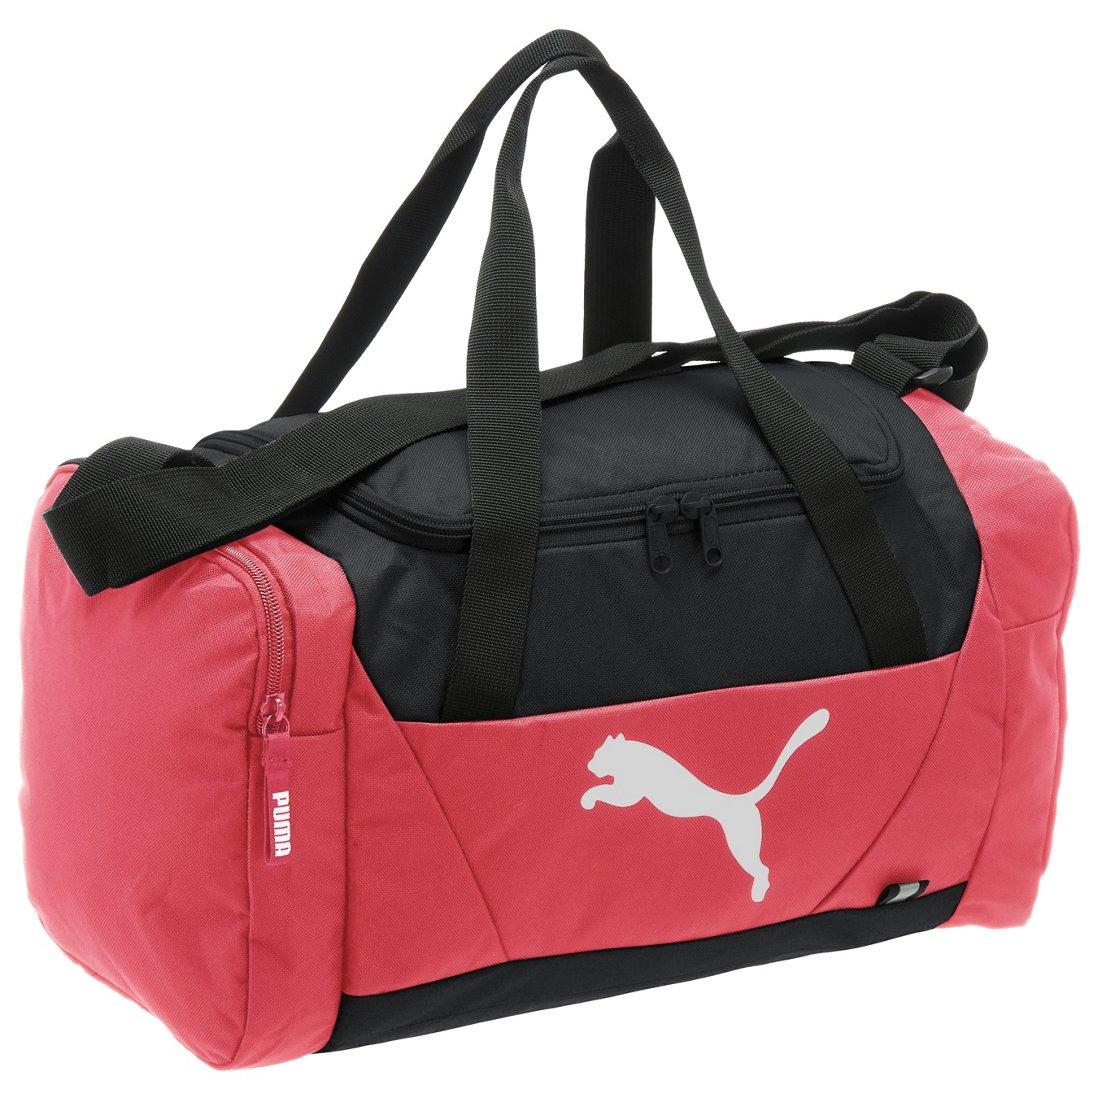 Puma Fundamentals Sporttasche 38 cm - paradise pink